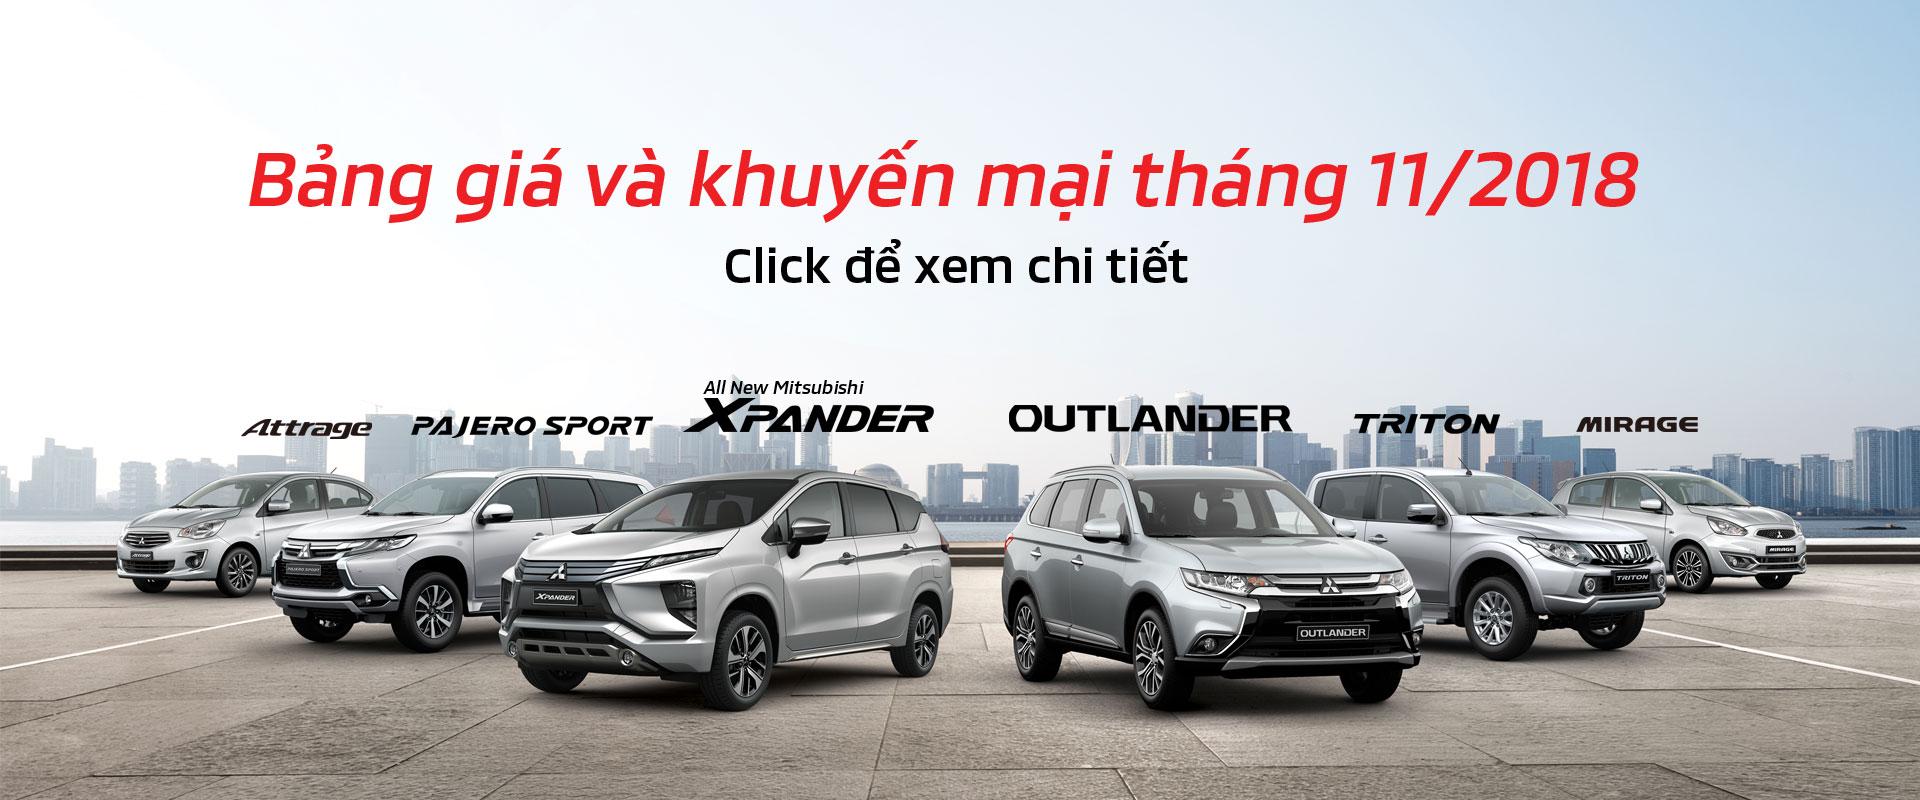 Khuyến mại Mitsubishi